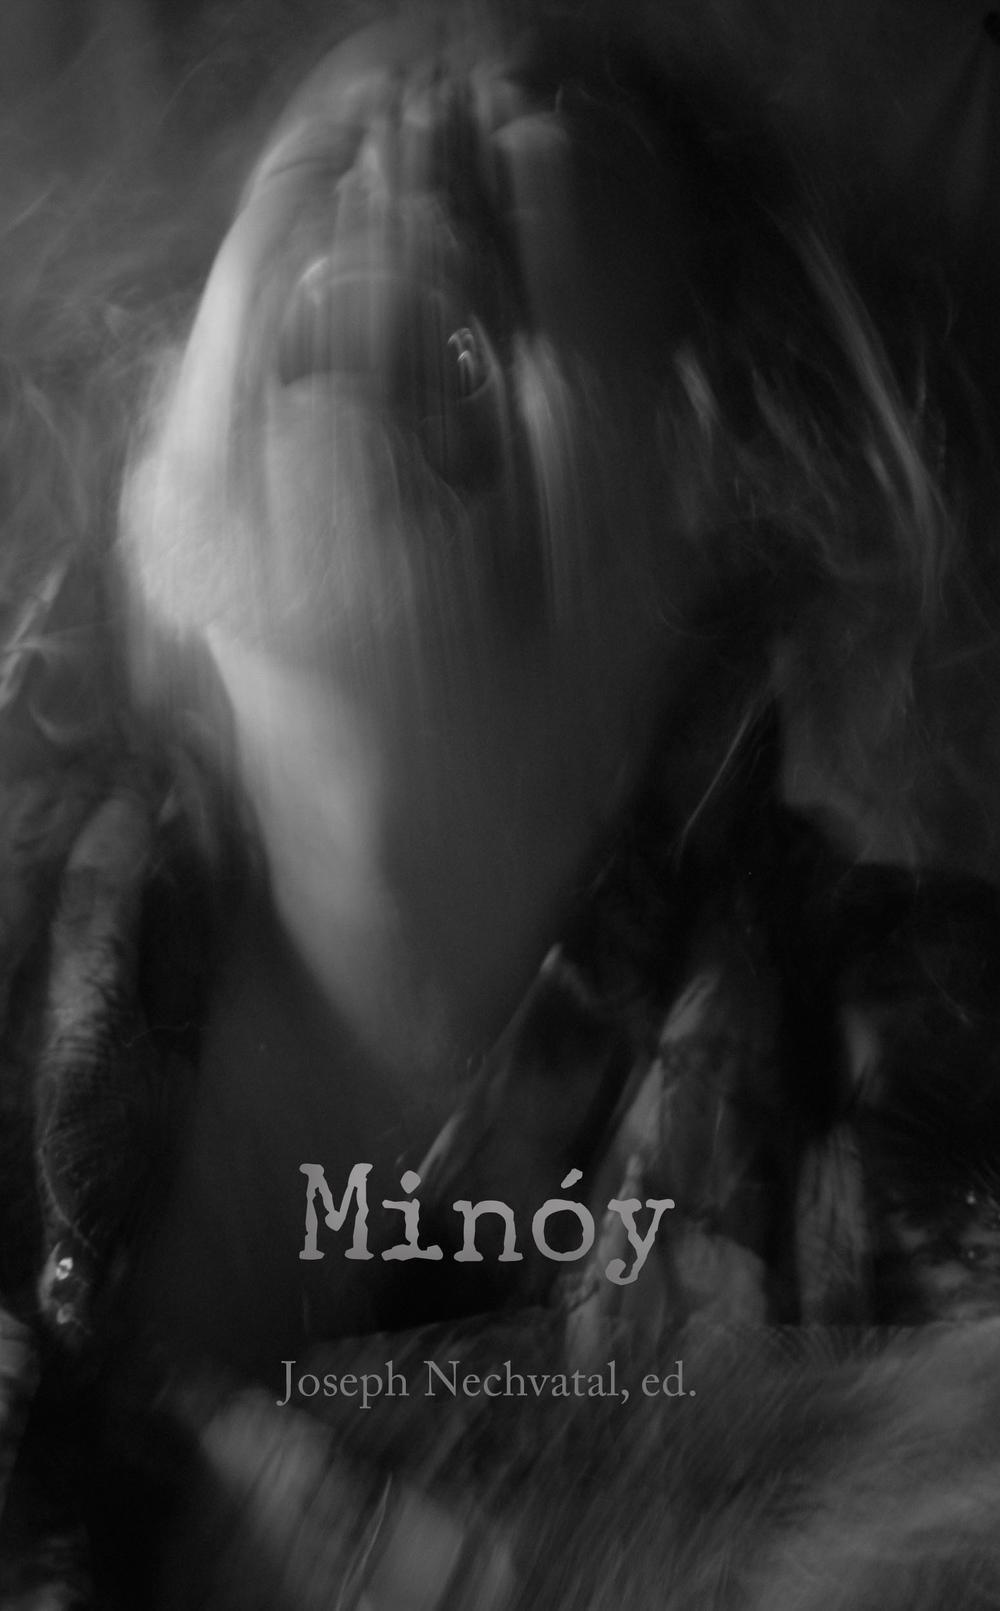 Minóy [book]